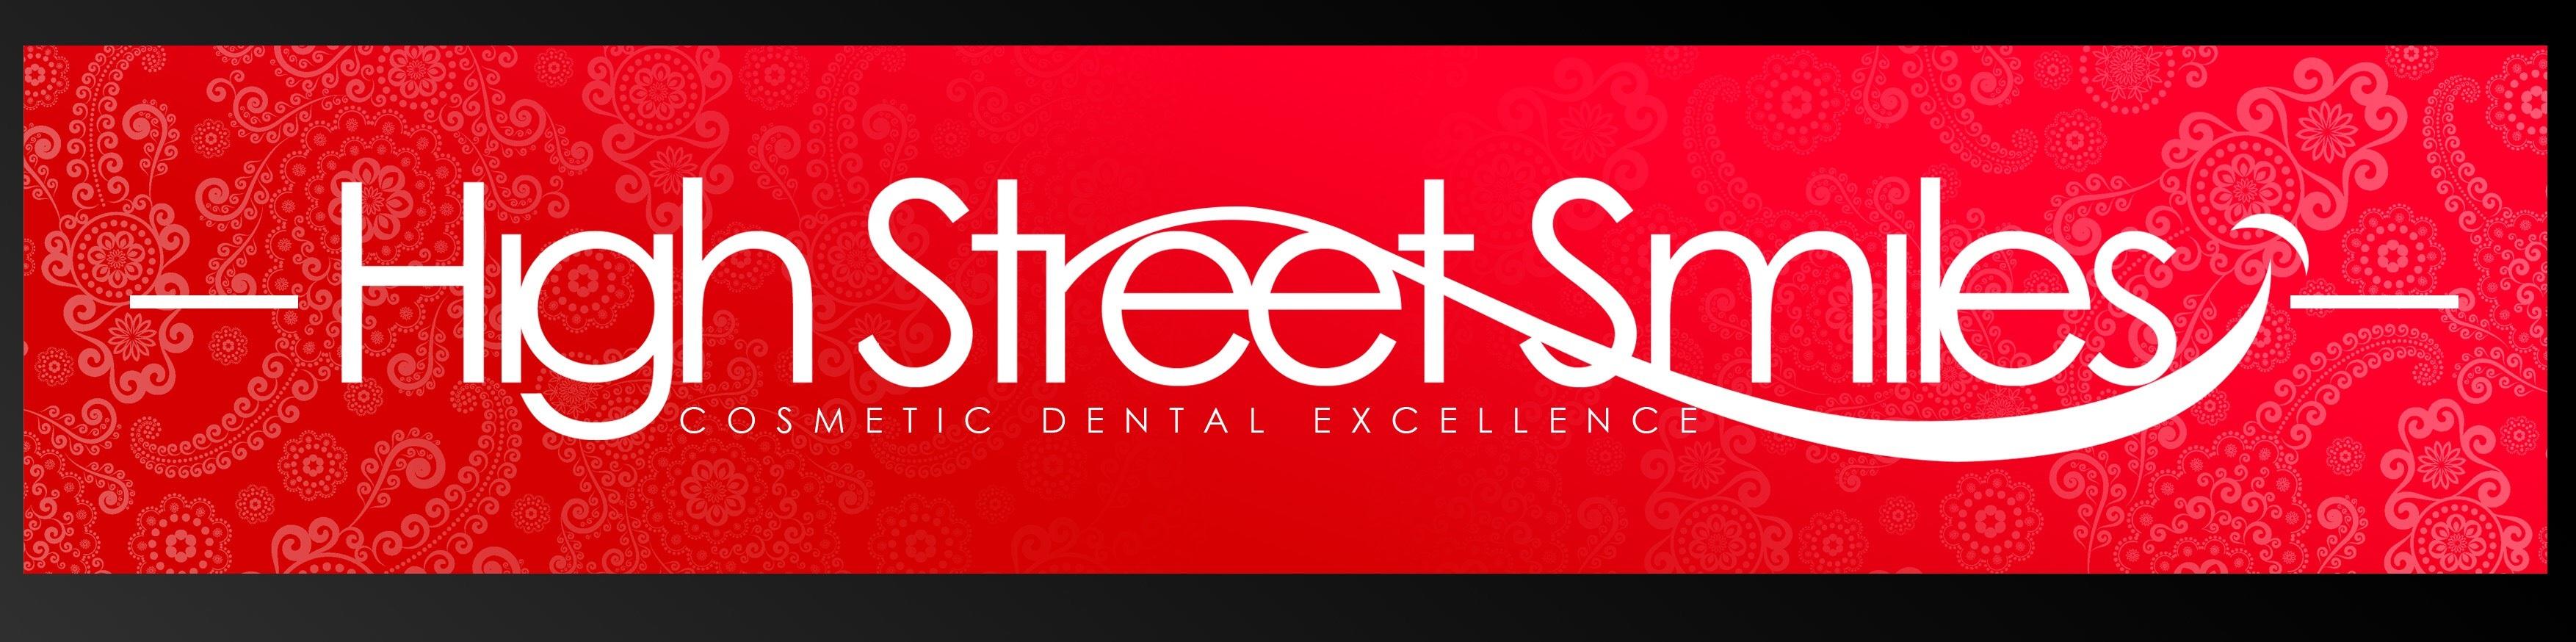 High Street Smiles